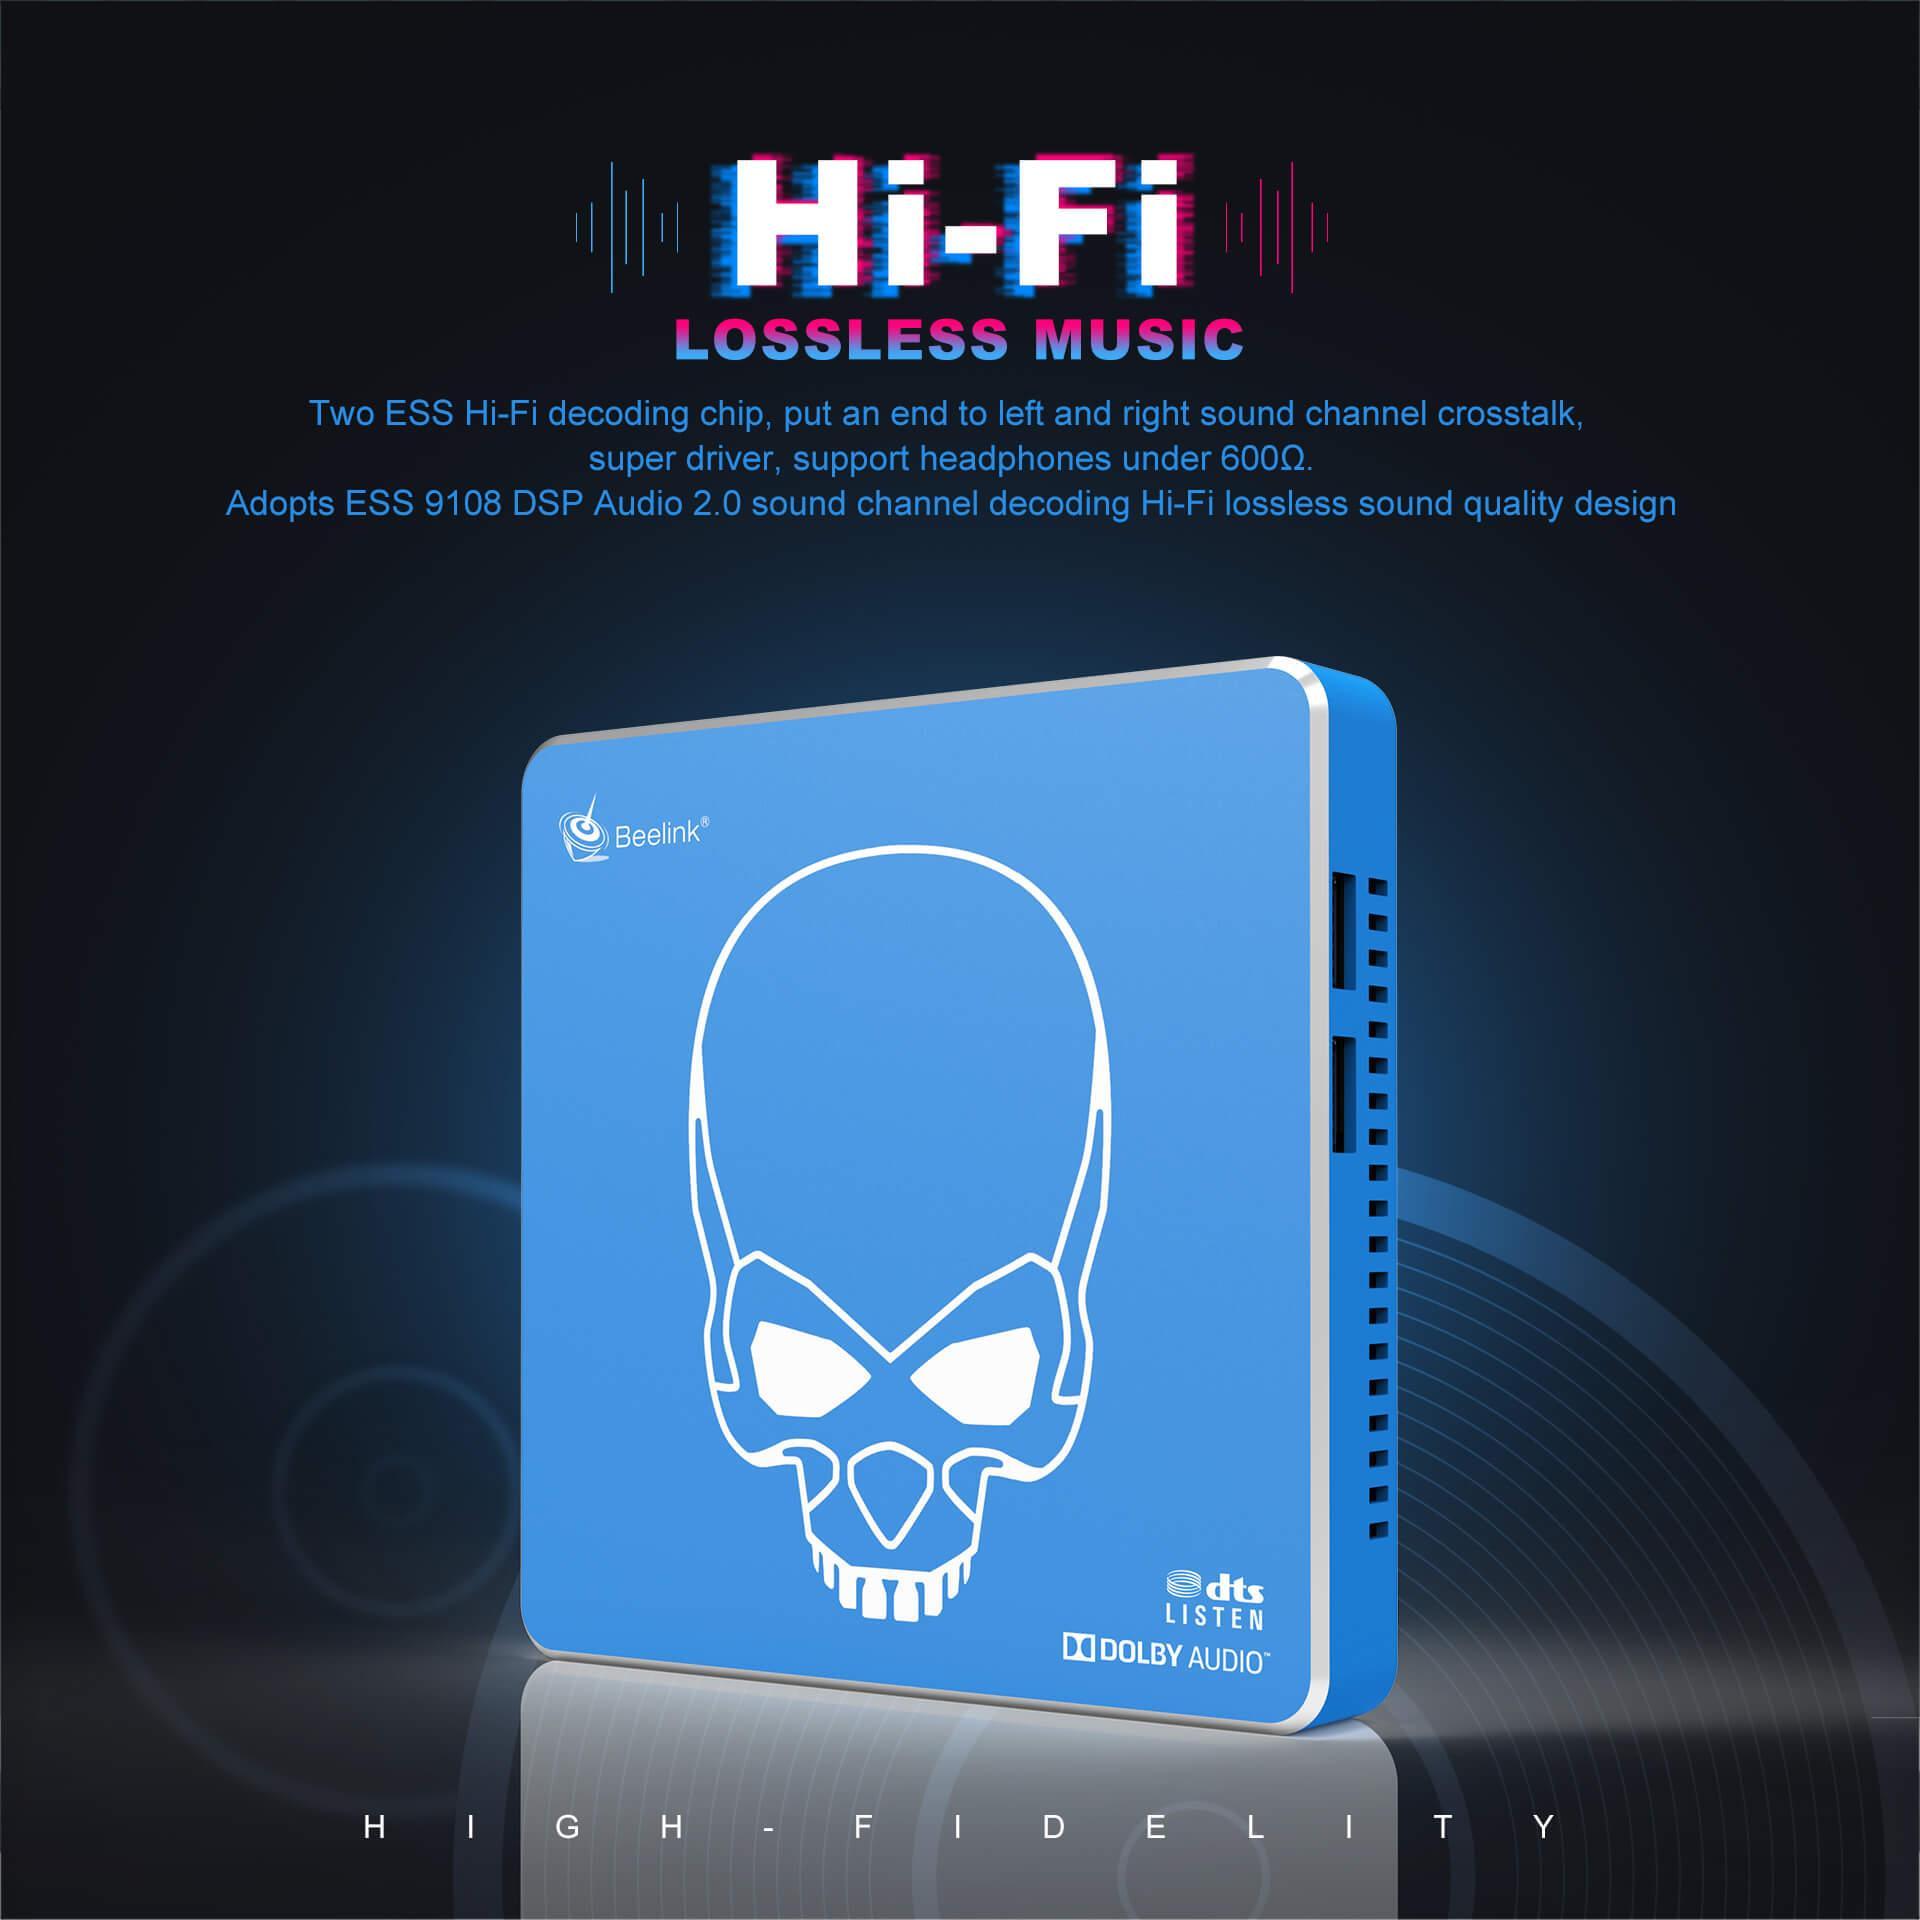 سیستم صوتی Hifi Lossless اندروید باکس Beelink GT King Pro